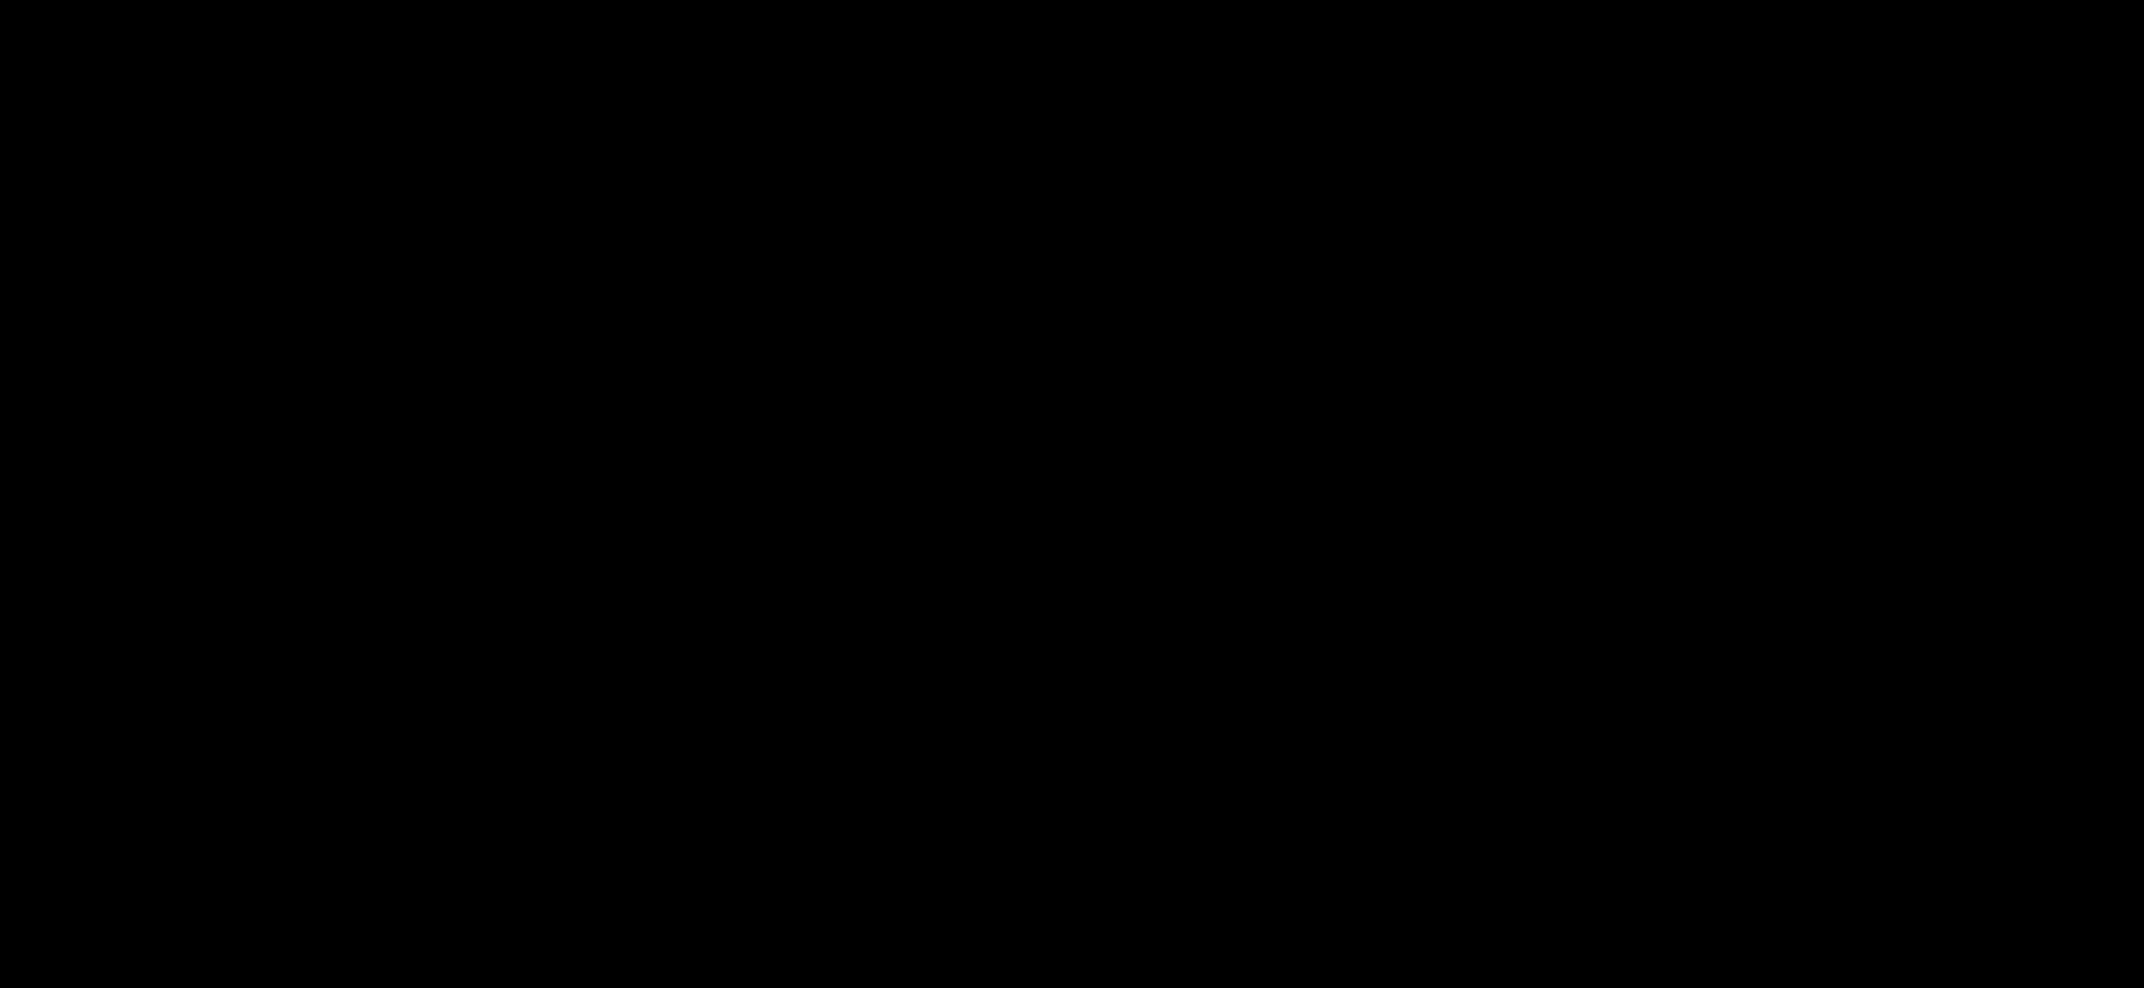 Armani Exchange. Brand logo 913e2aa8d4